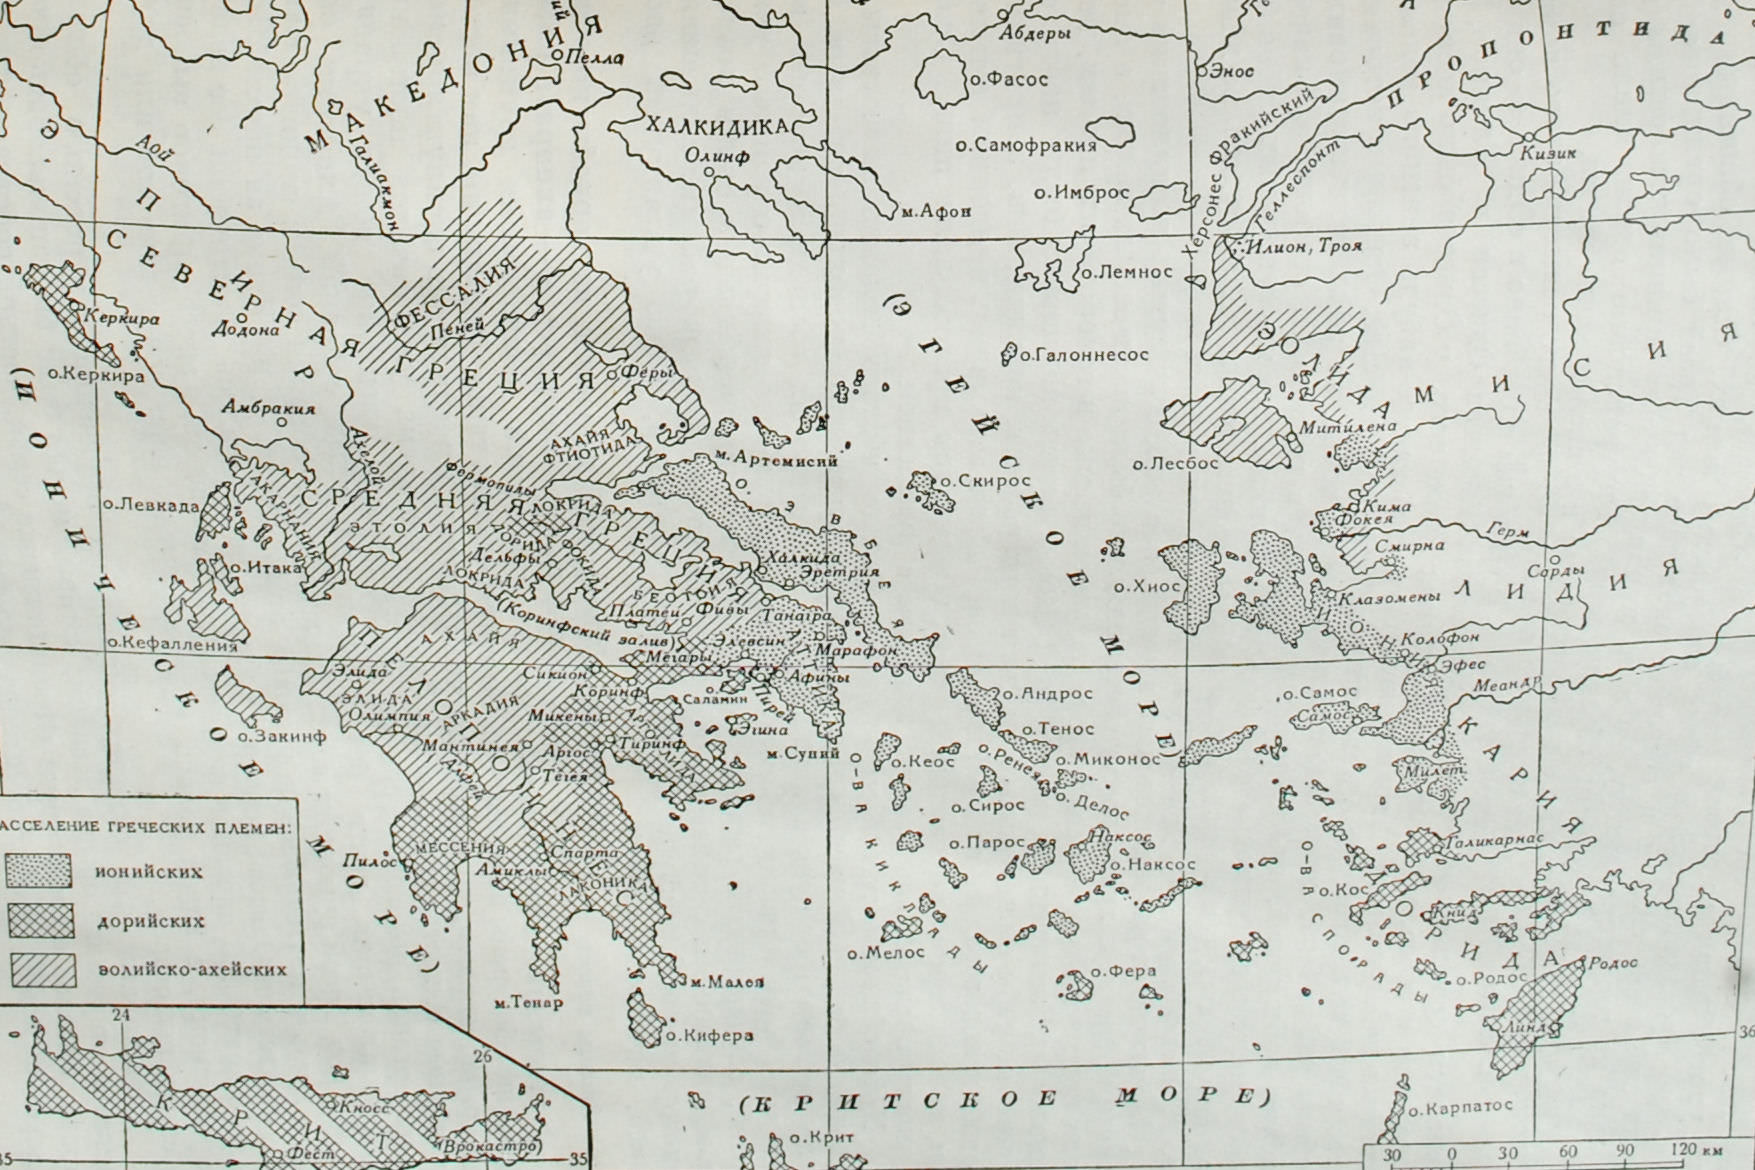 Греция в IX - VIII вв. до н.э.